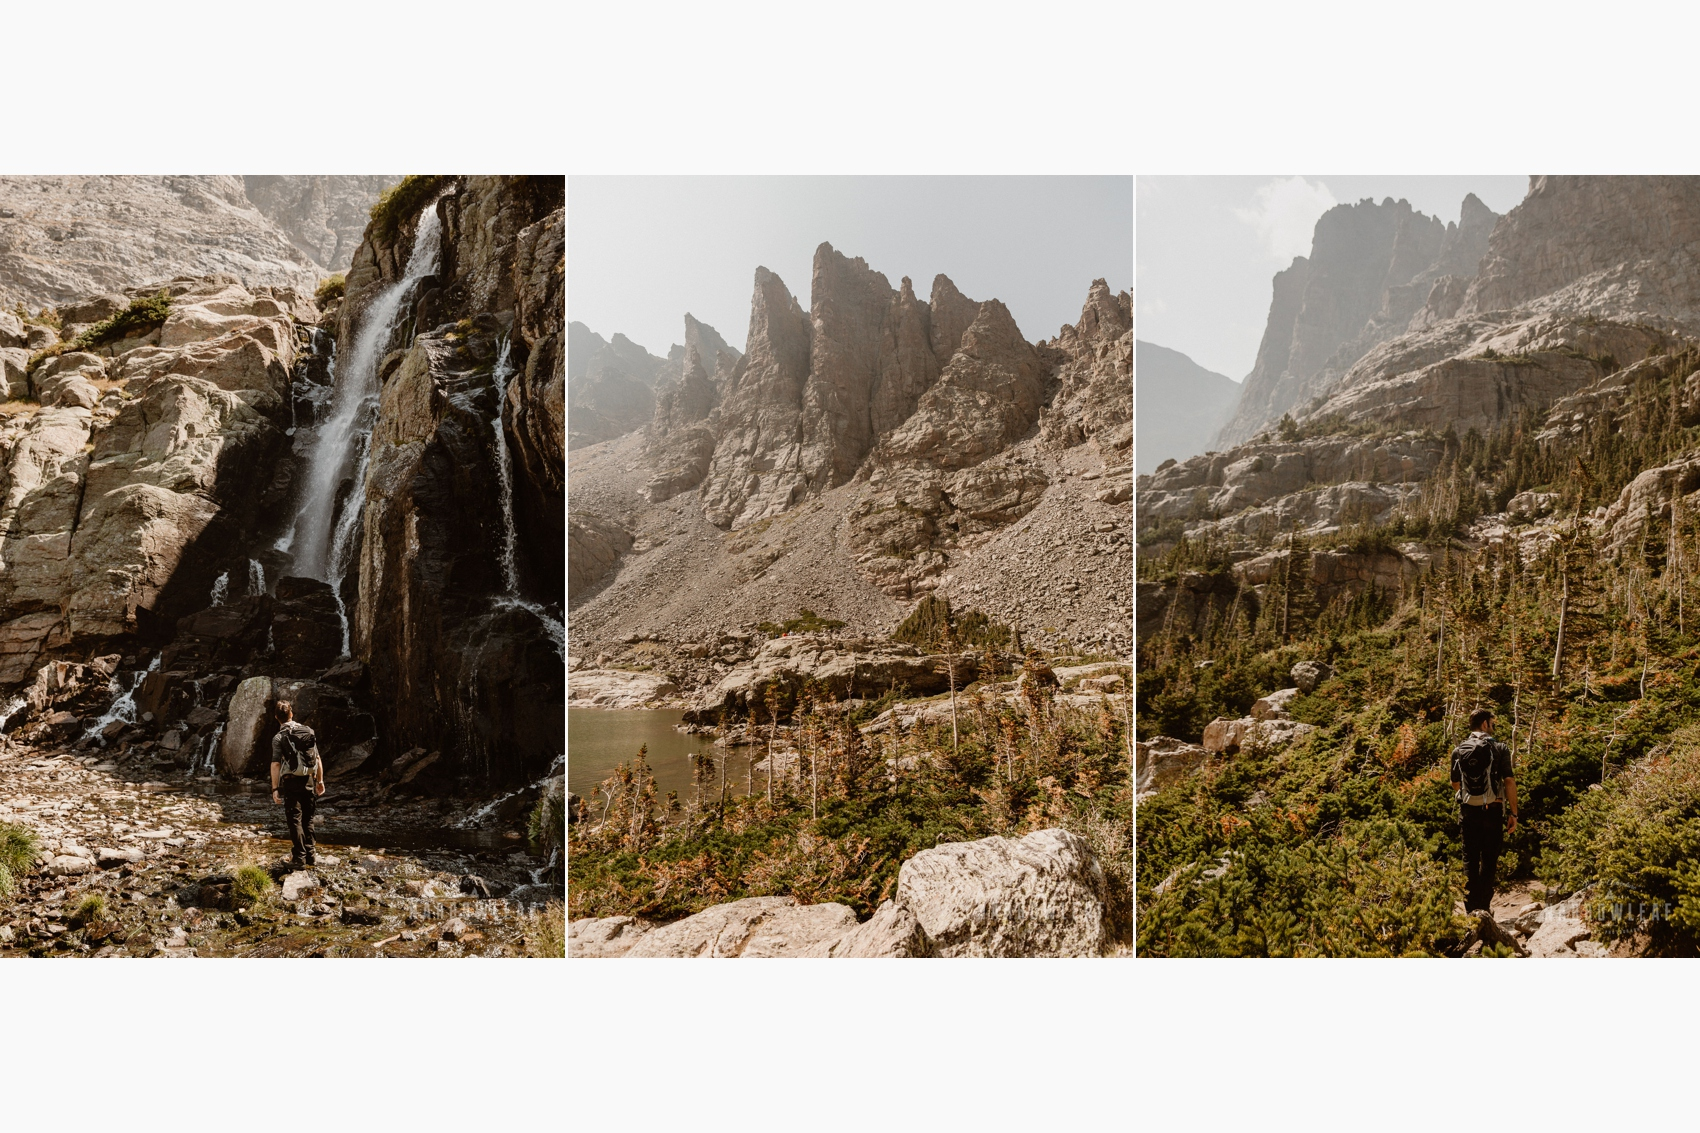 hiking-adventure-photographer-narrowleaf-photography009-010.jpg